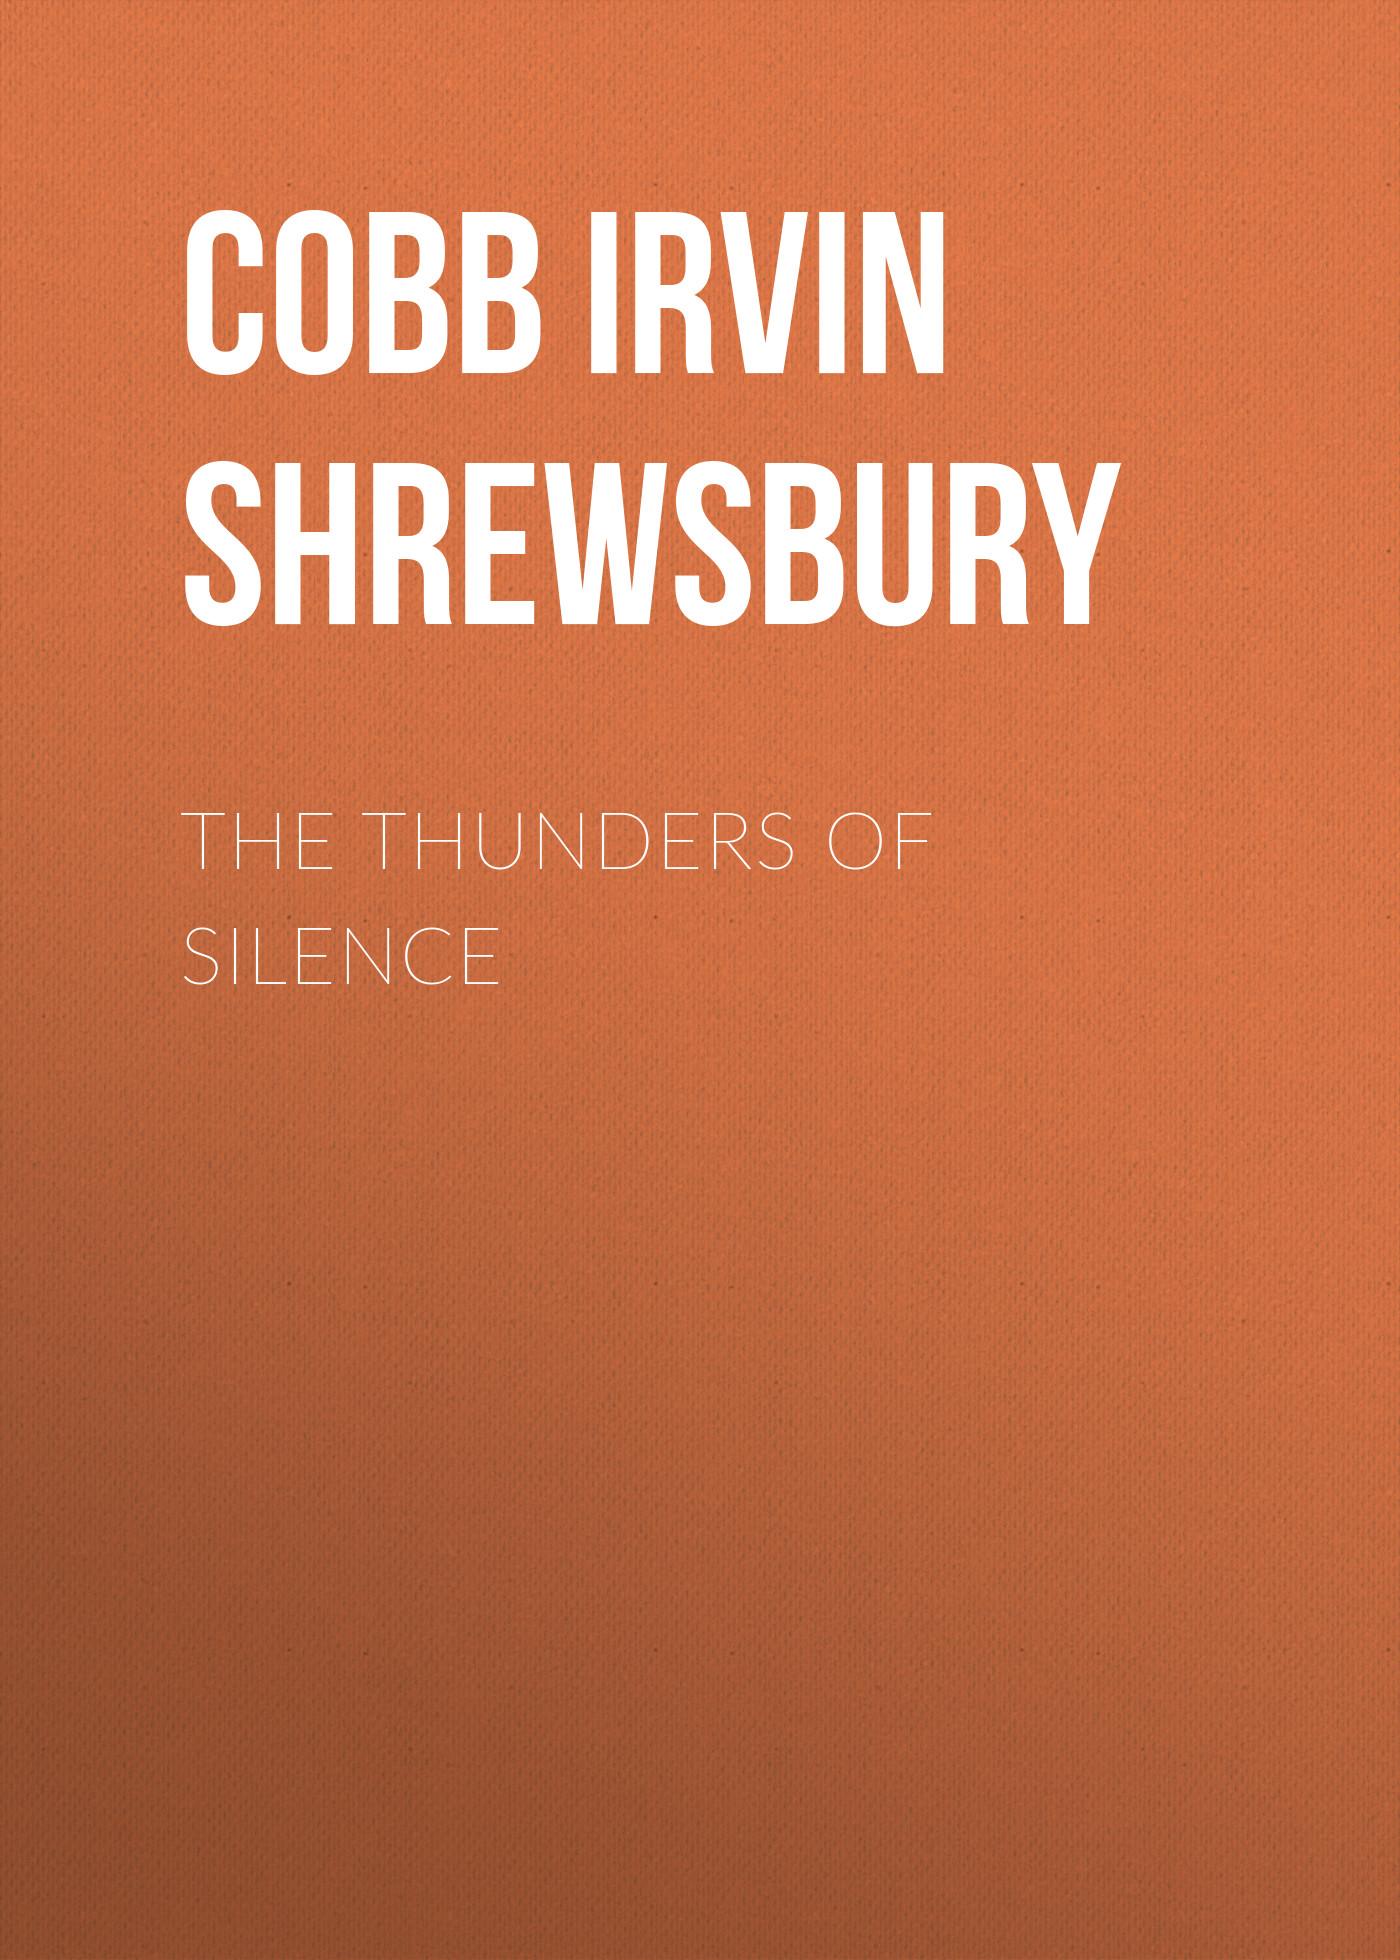 Cobb Irvin Shrewsbury The Thunders of Silence cobb irvin shrewsbury sundry accounts